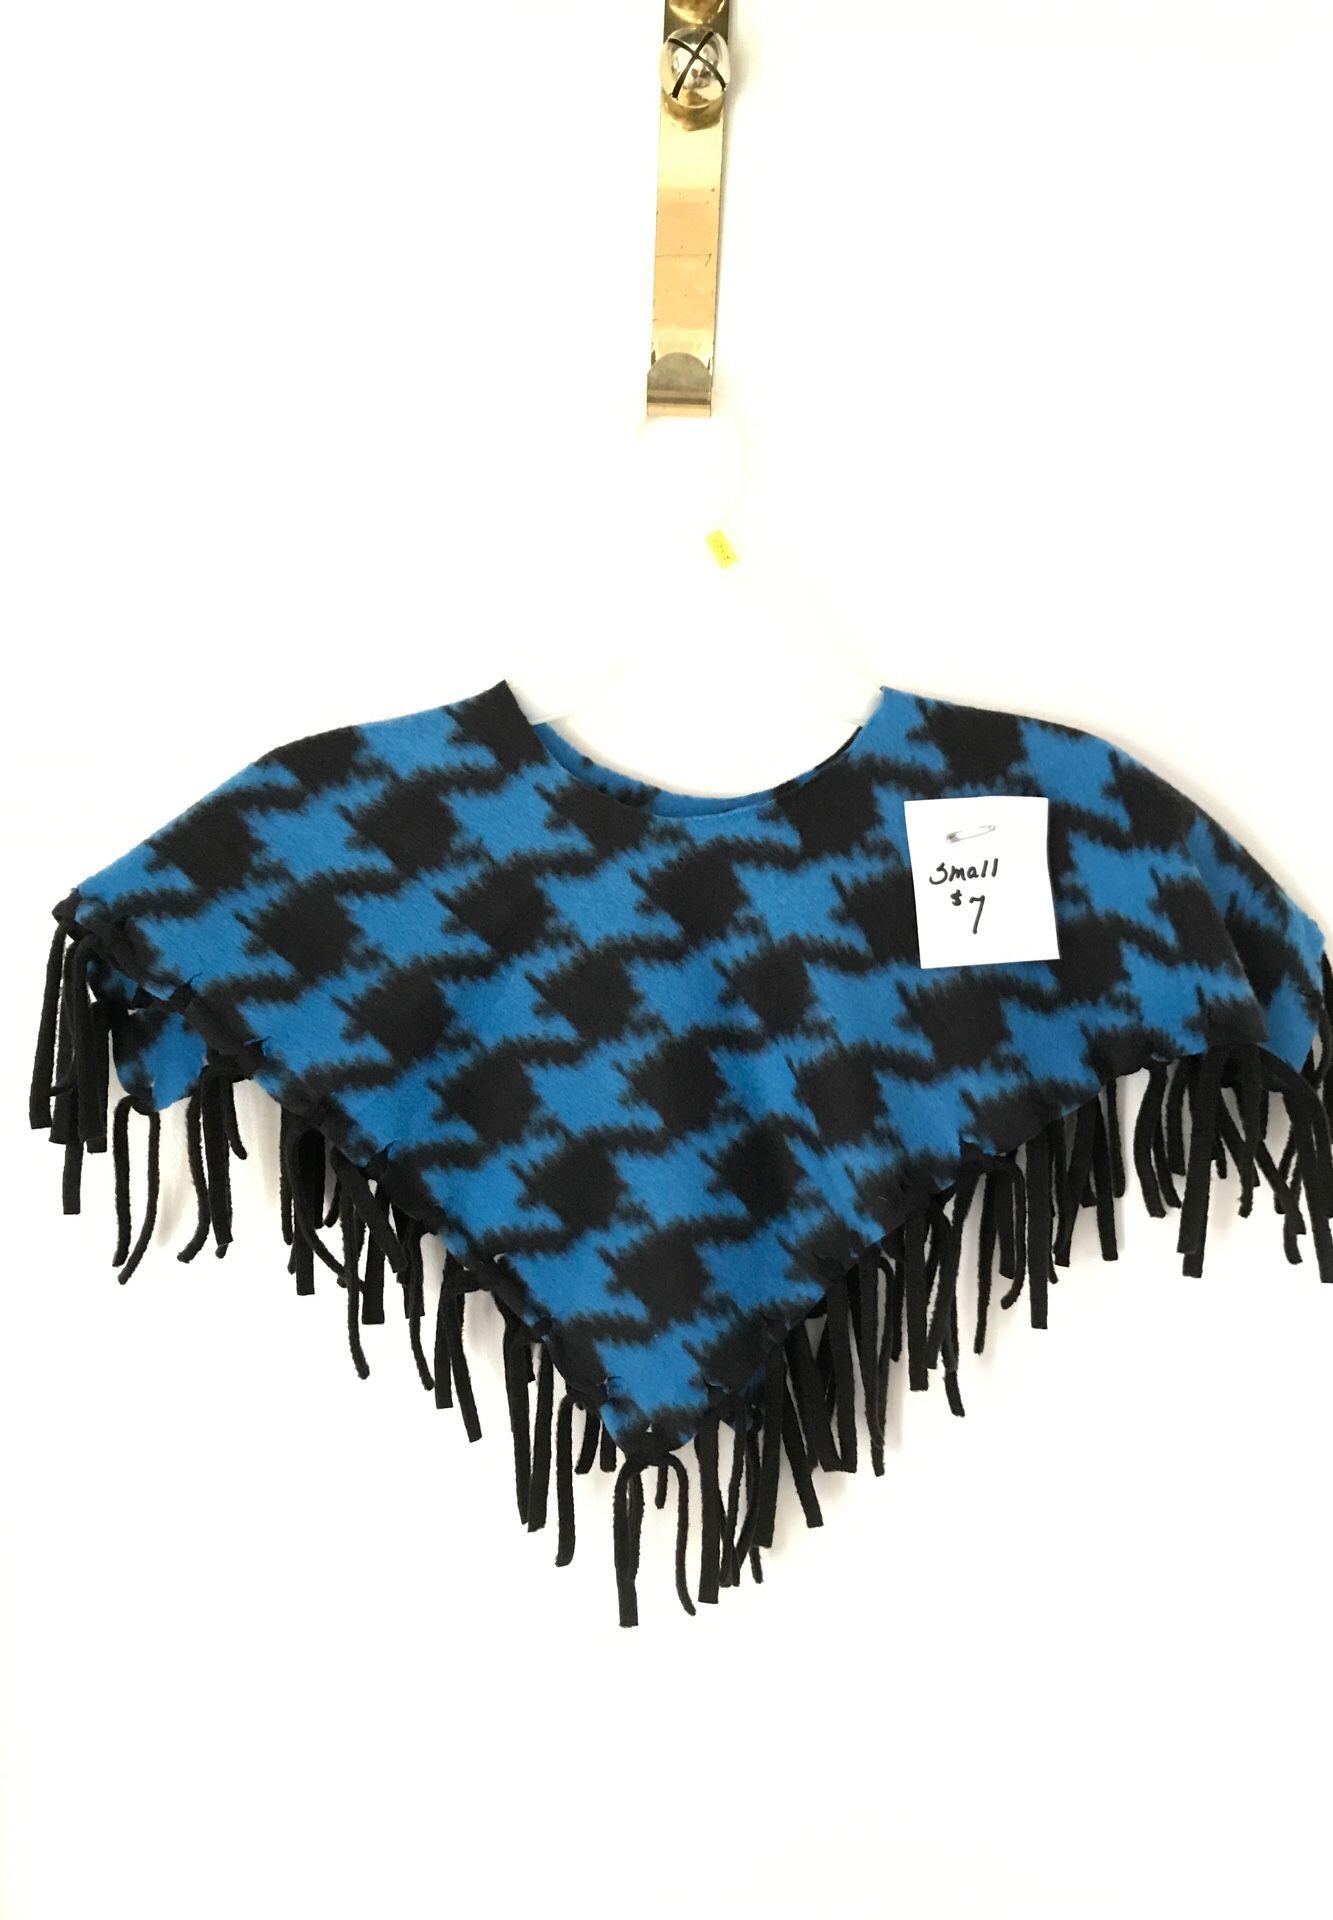 Handmade fleece poncho blue and black small